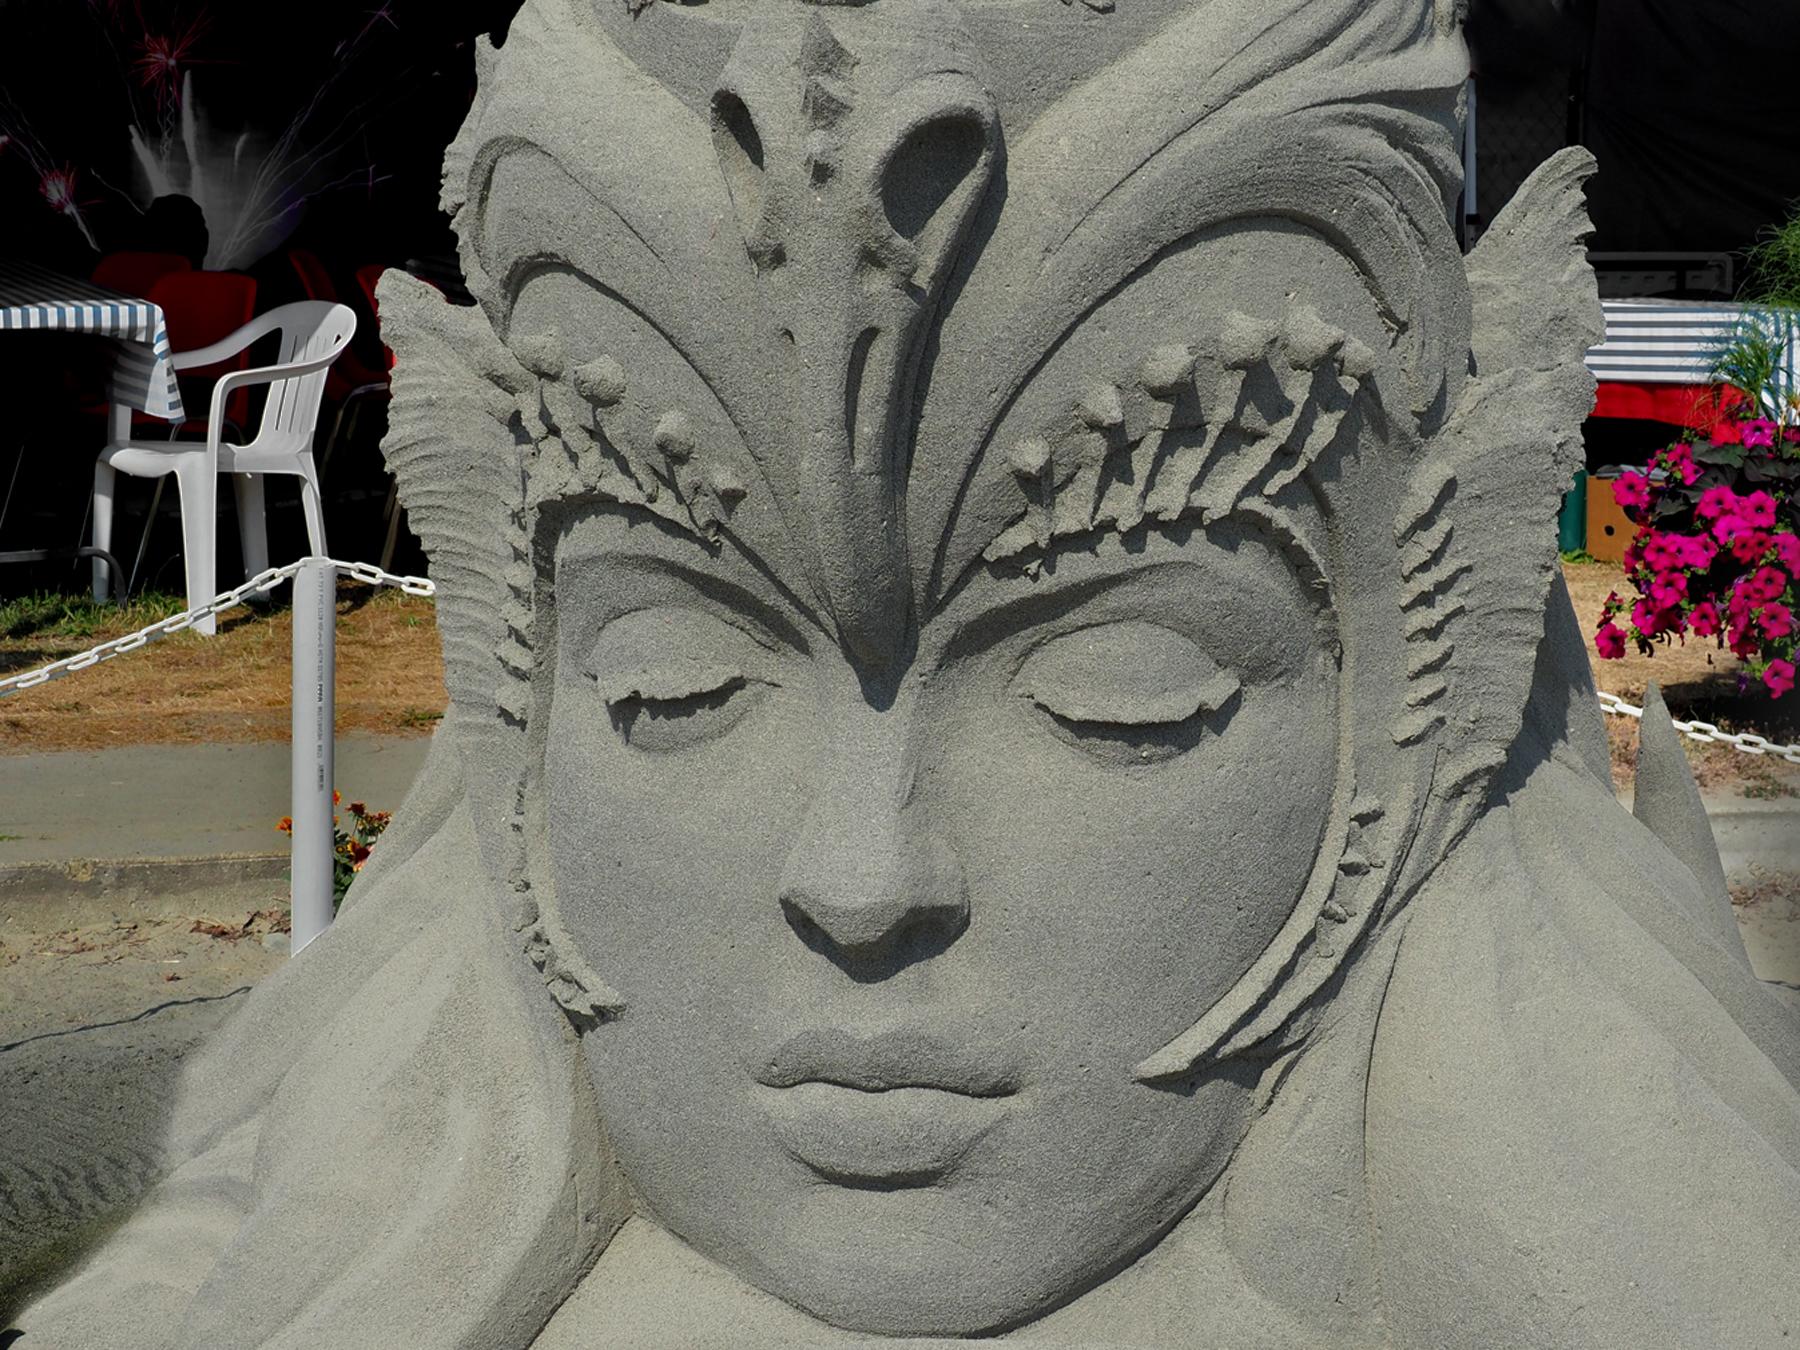 Kunstwerk aus Sand